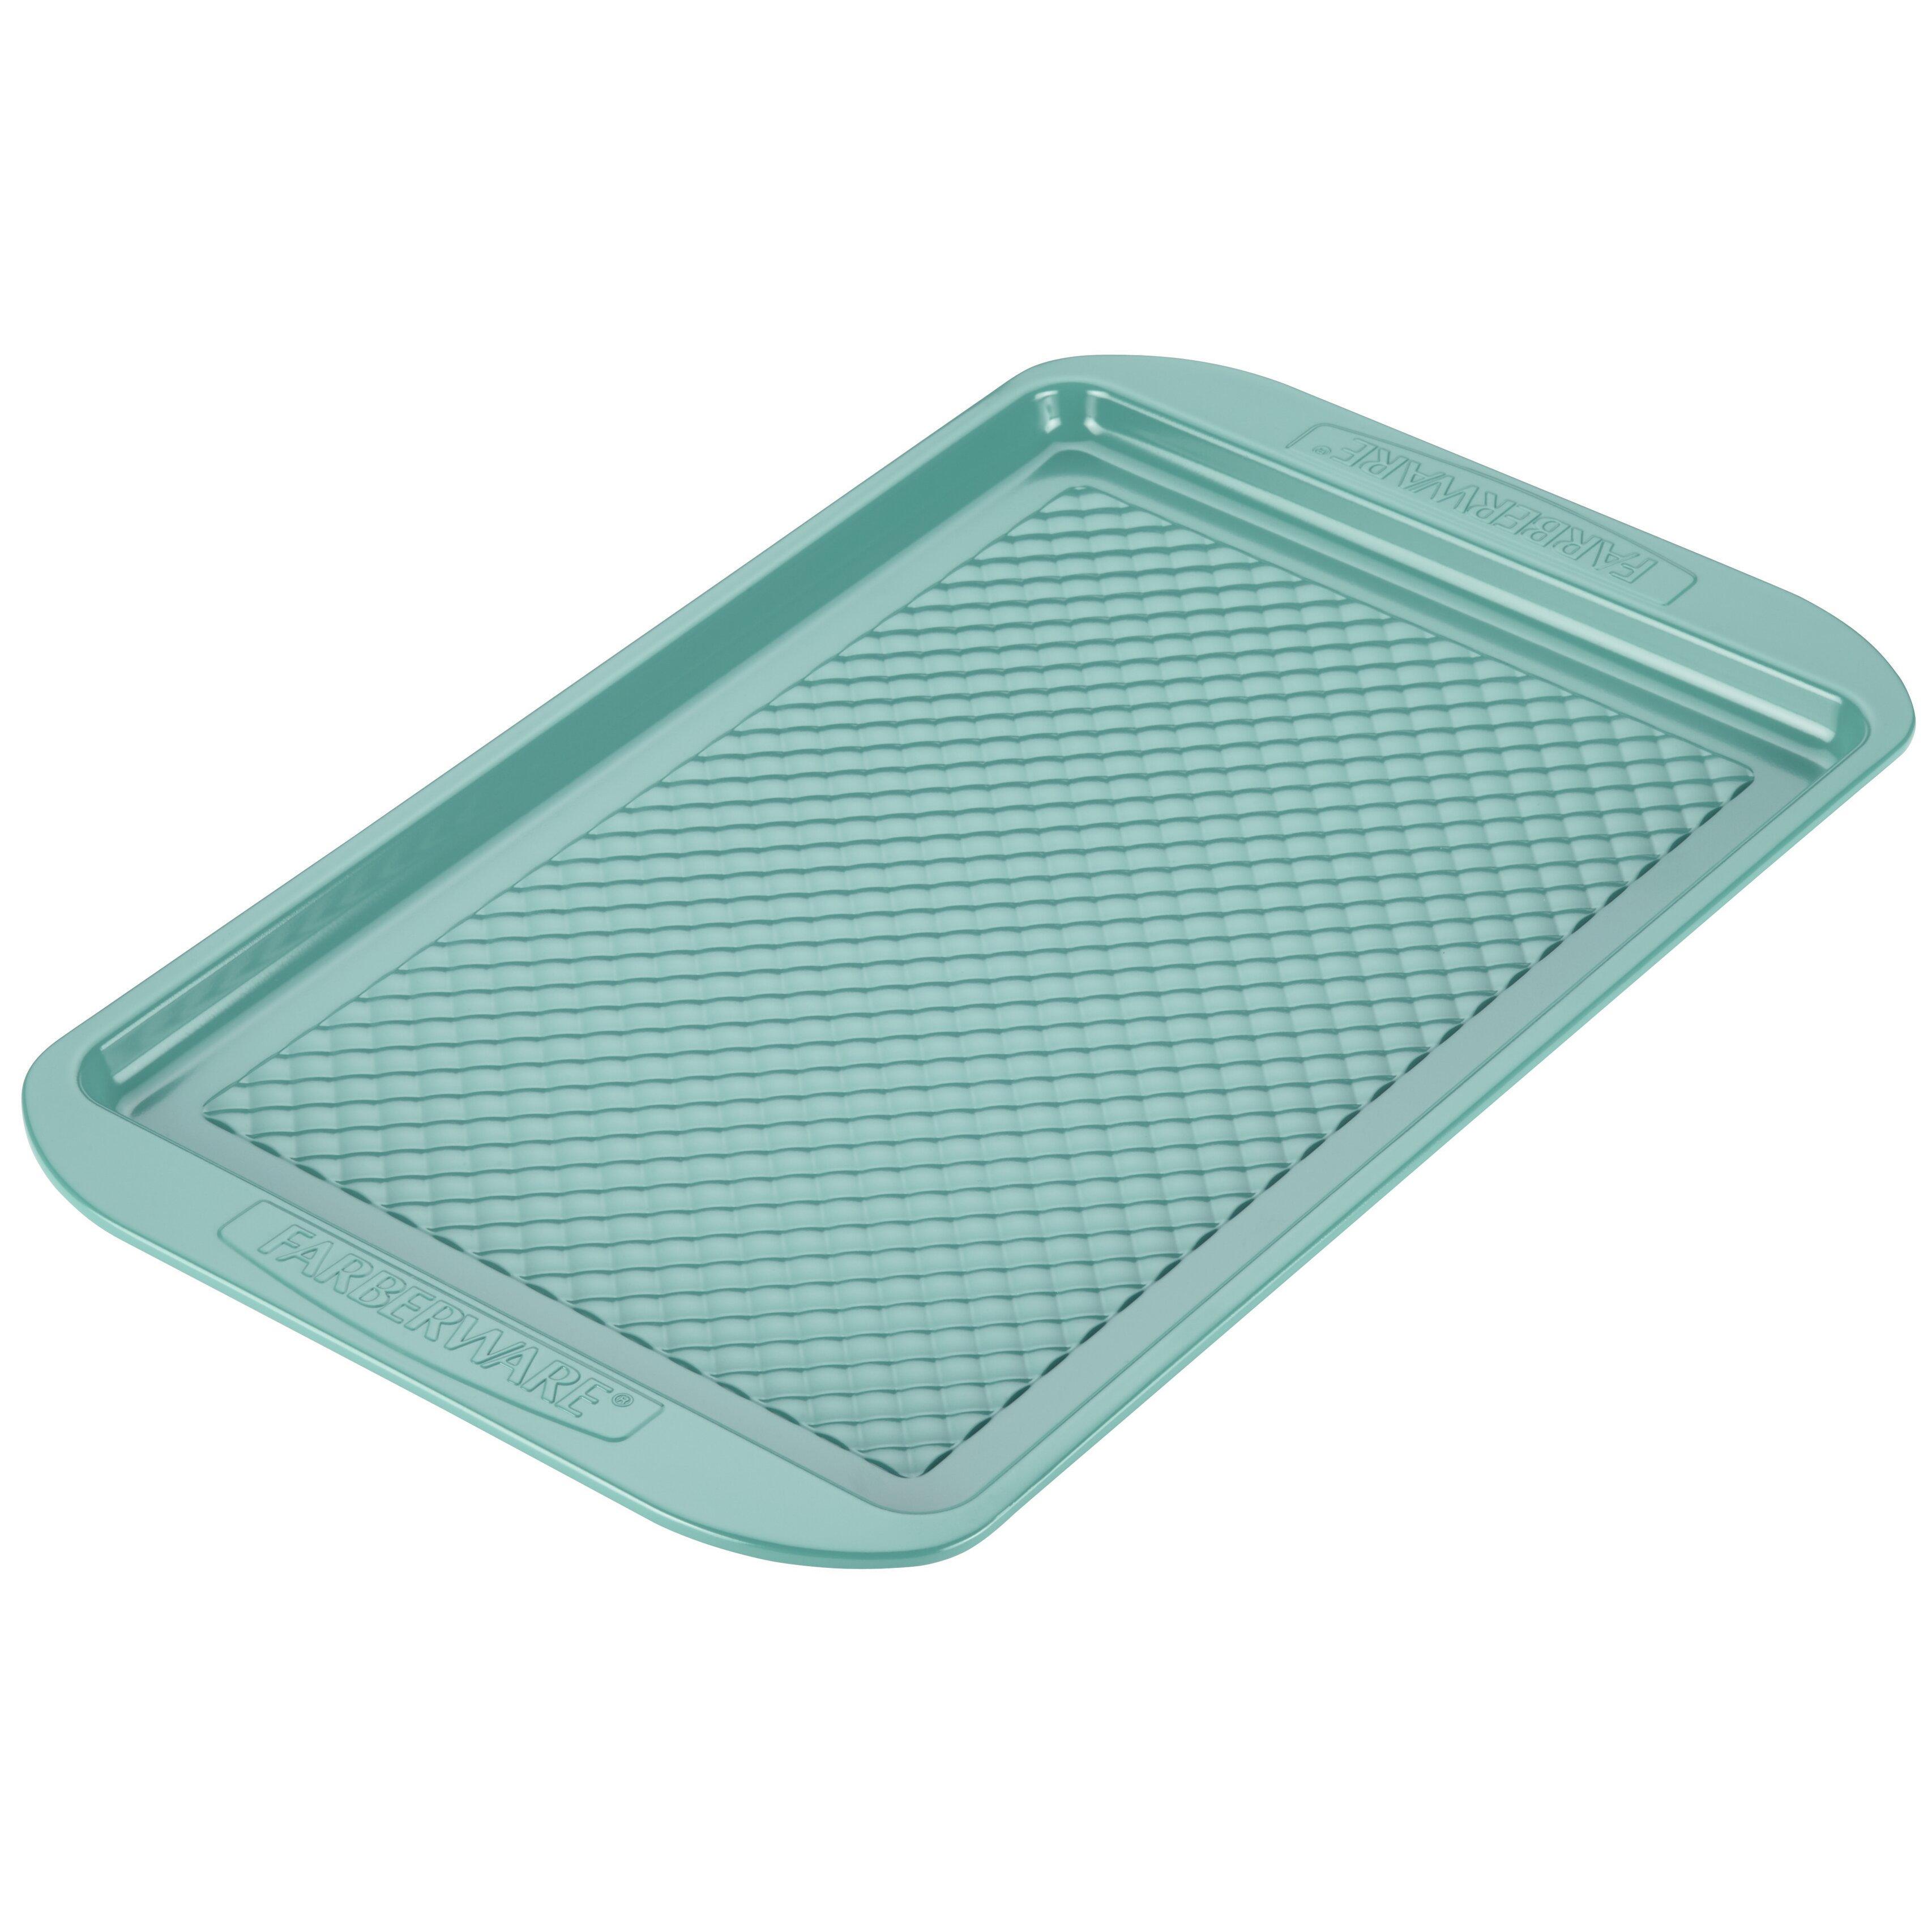 Farberware Purecook Hybrid Ceramic Nonstick Bakeware